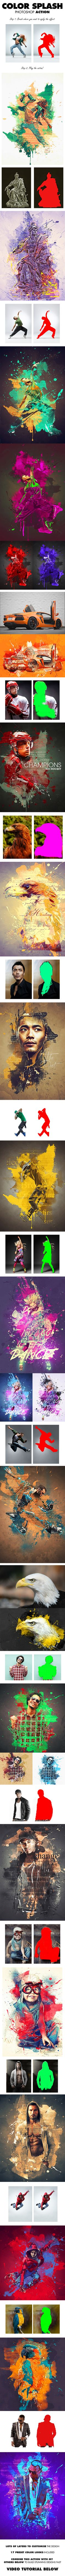 Color Splash Photoshop Action - Photo Effects Actions